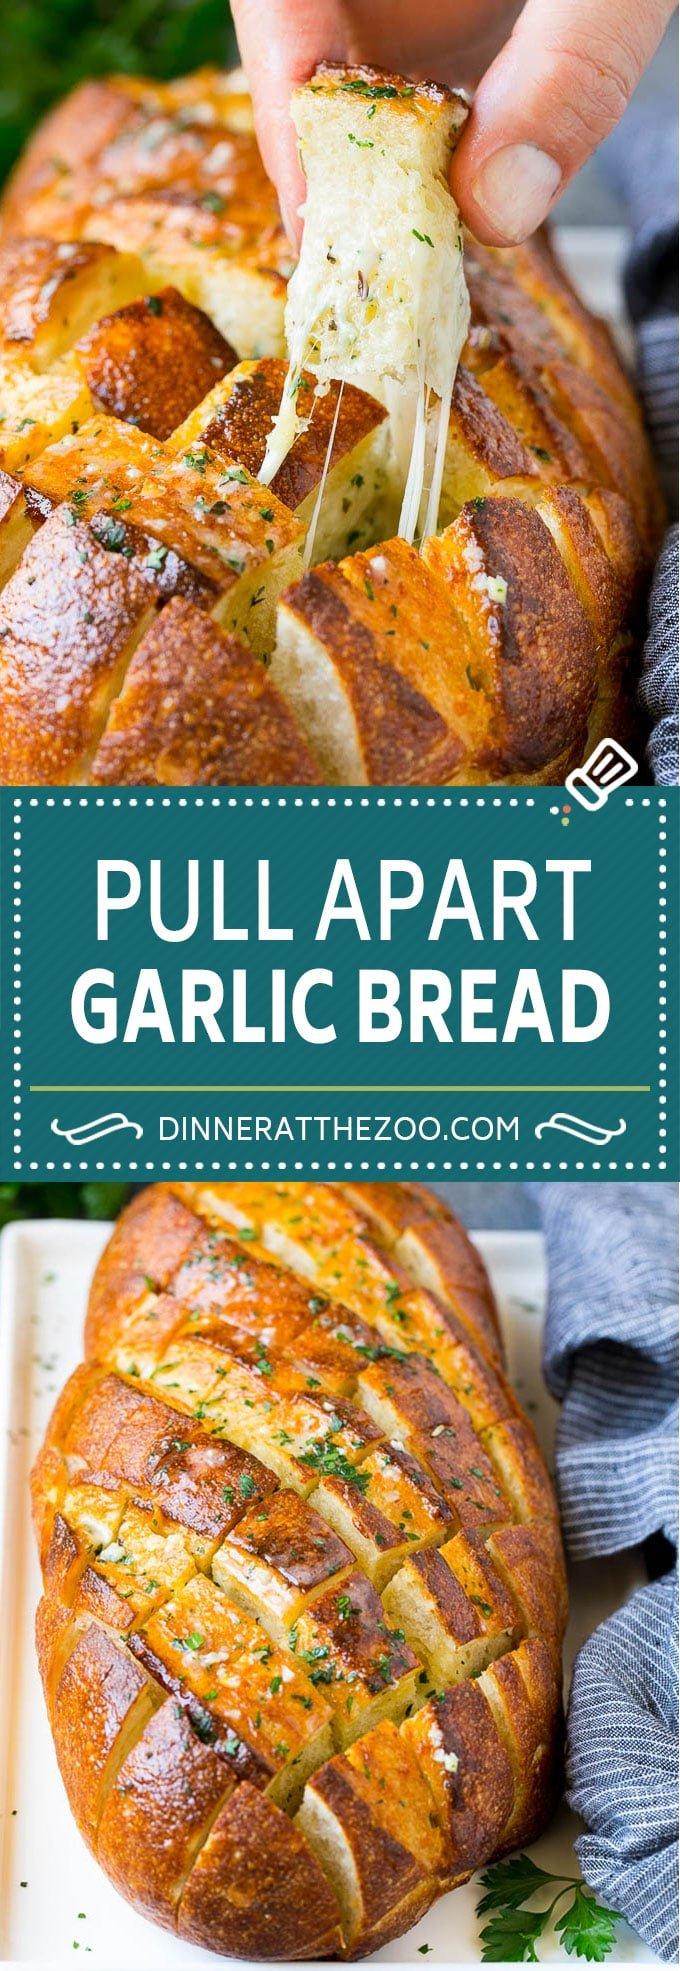 Pull Apart Bread | Garlic Bread | Cheese Bread #bread #garlic #cheese #sidedish #appetizer #dinneratthezoo